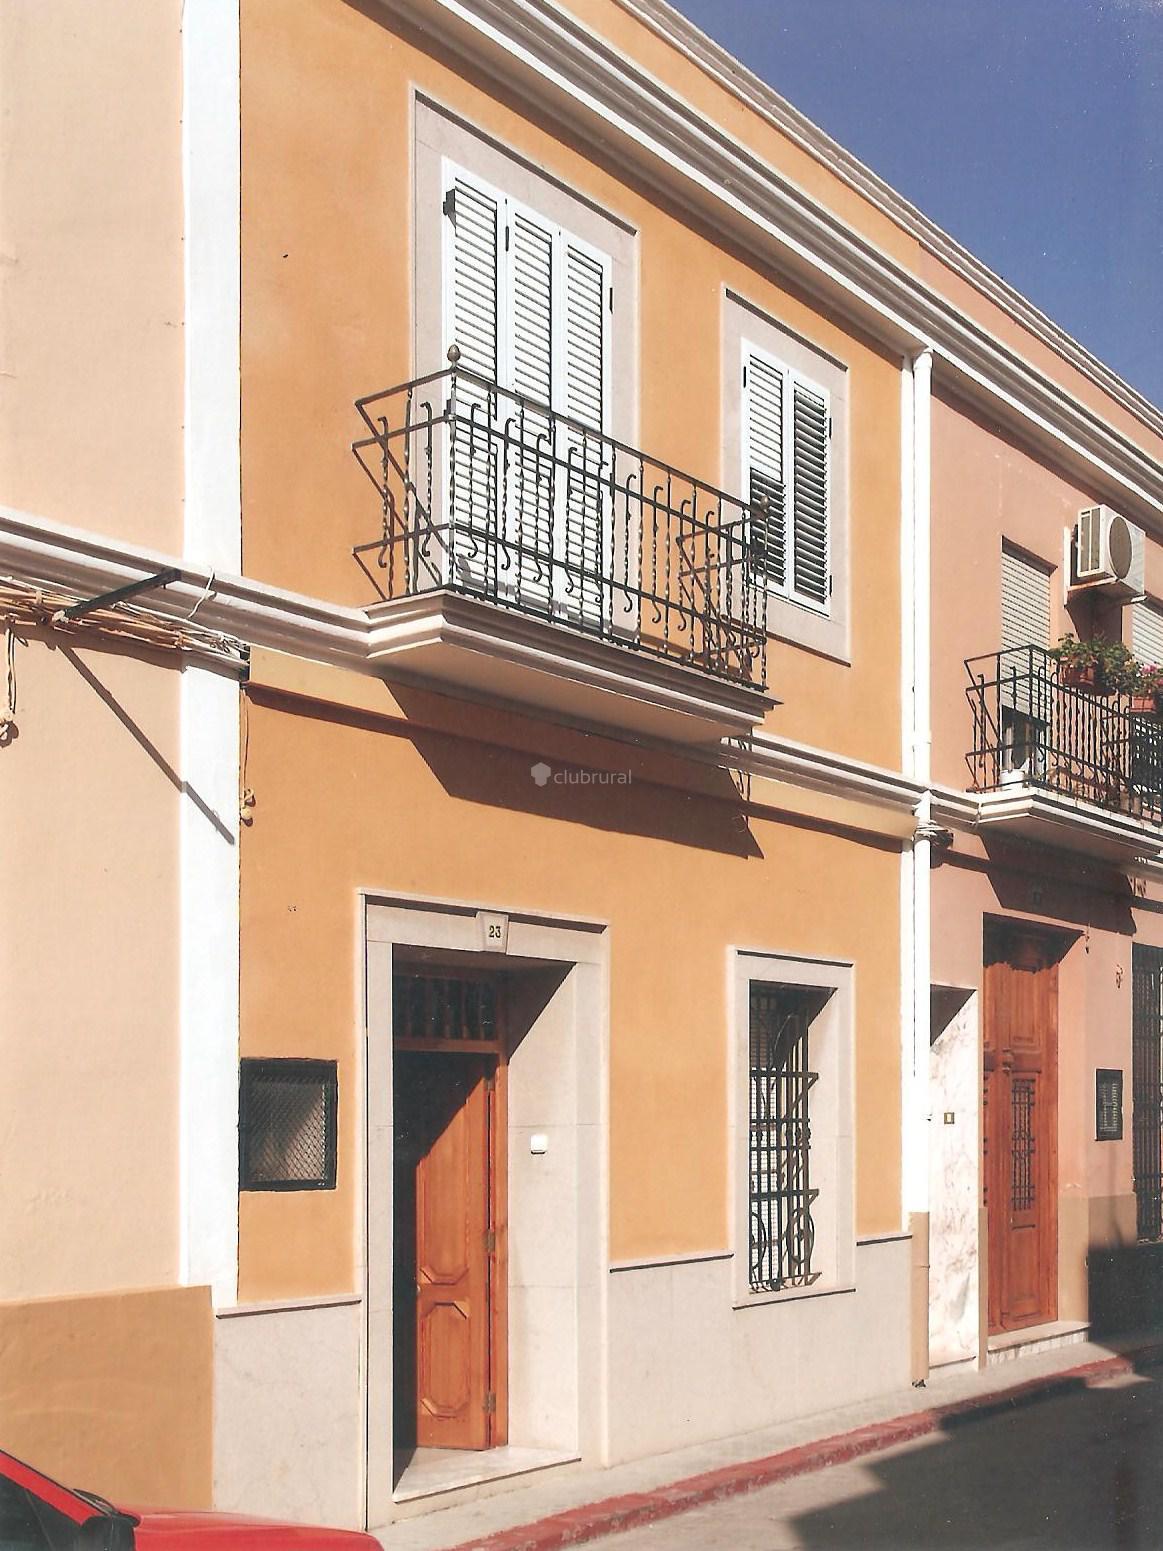 Fotos de ca matilde valencia albuixech clubrural - Ofertas casas rurales valencia ...